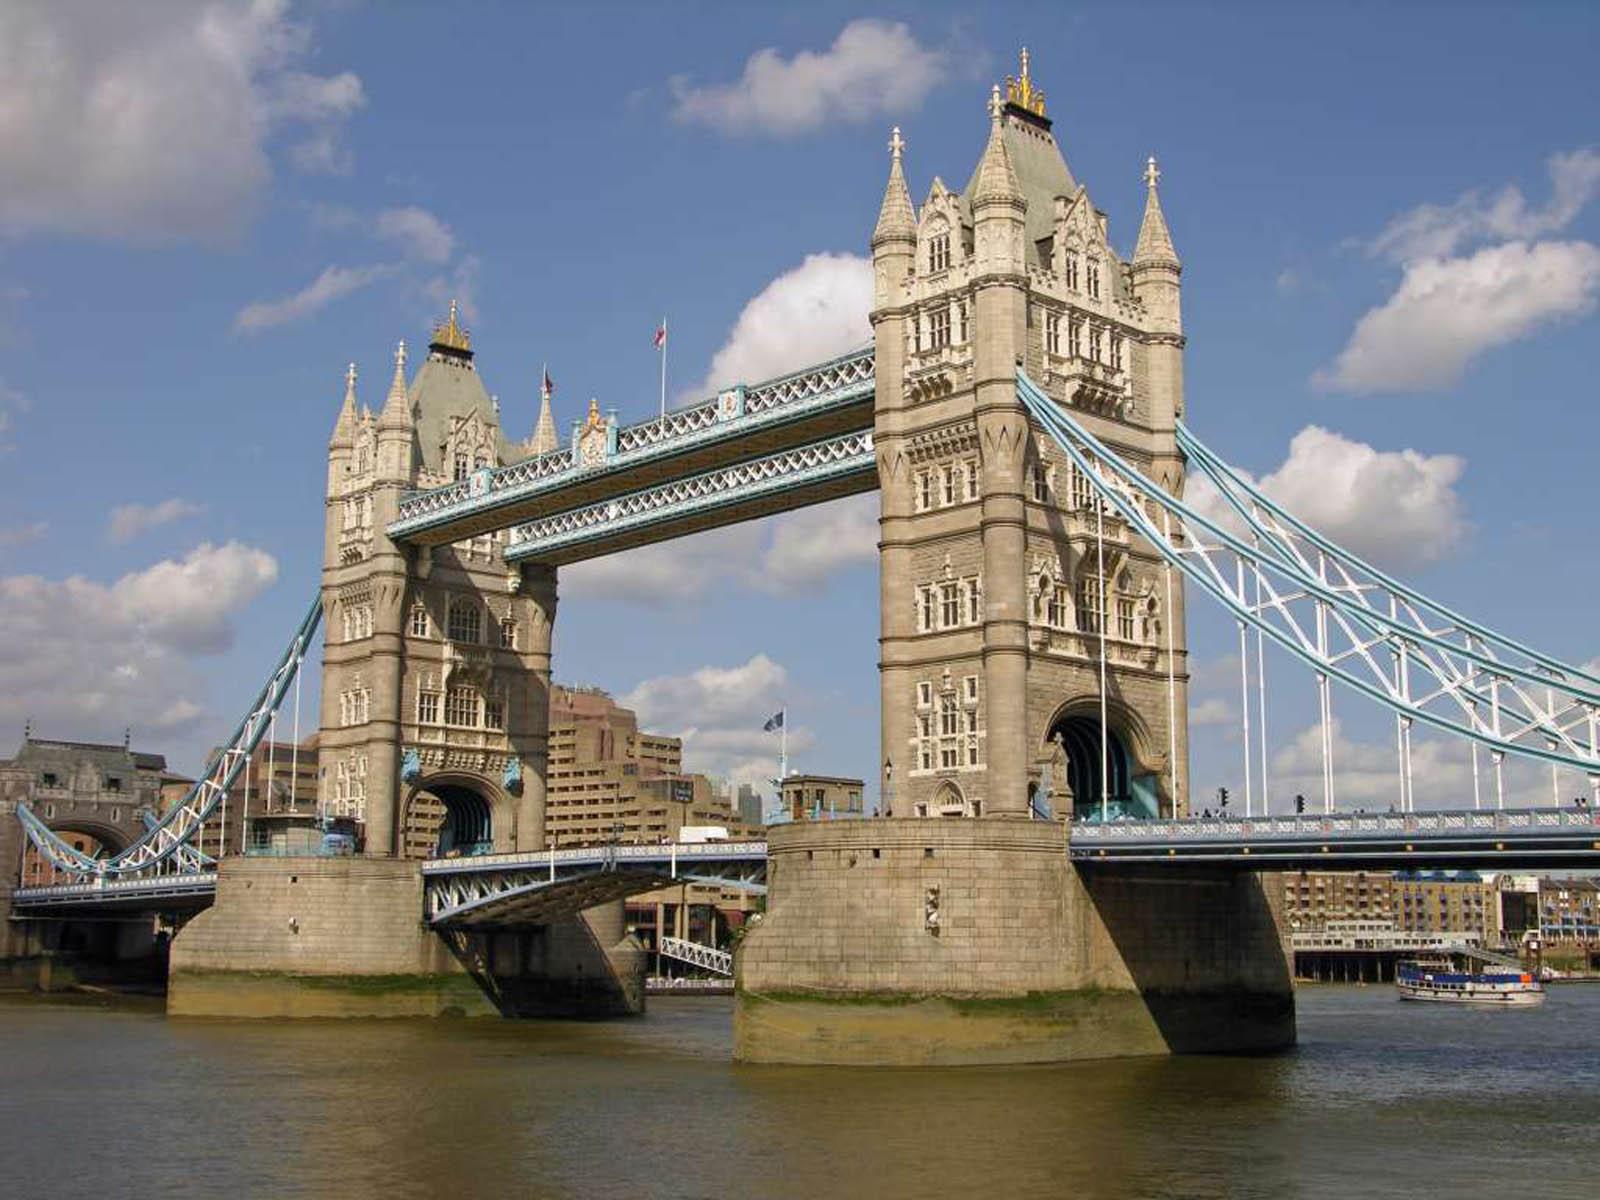 Pictures of London Bridge - 2013 Wallpapers